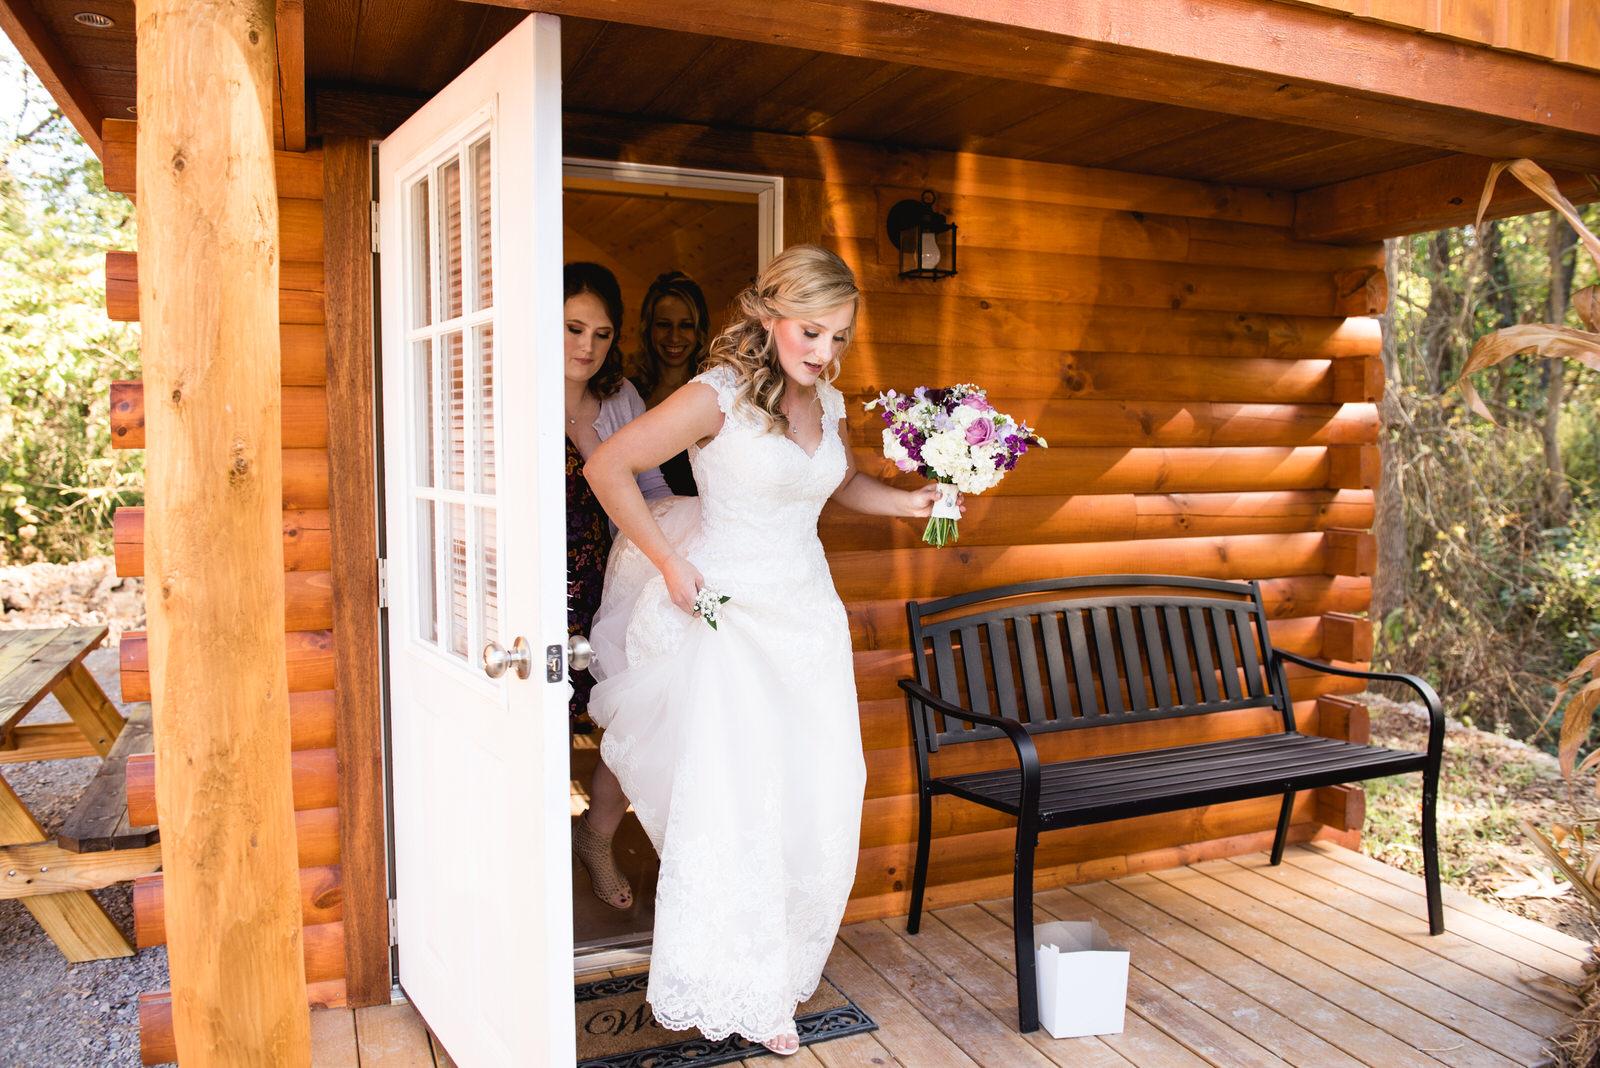 wedding_at_red_fox_winery_wedding_photographer012.jpg